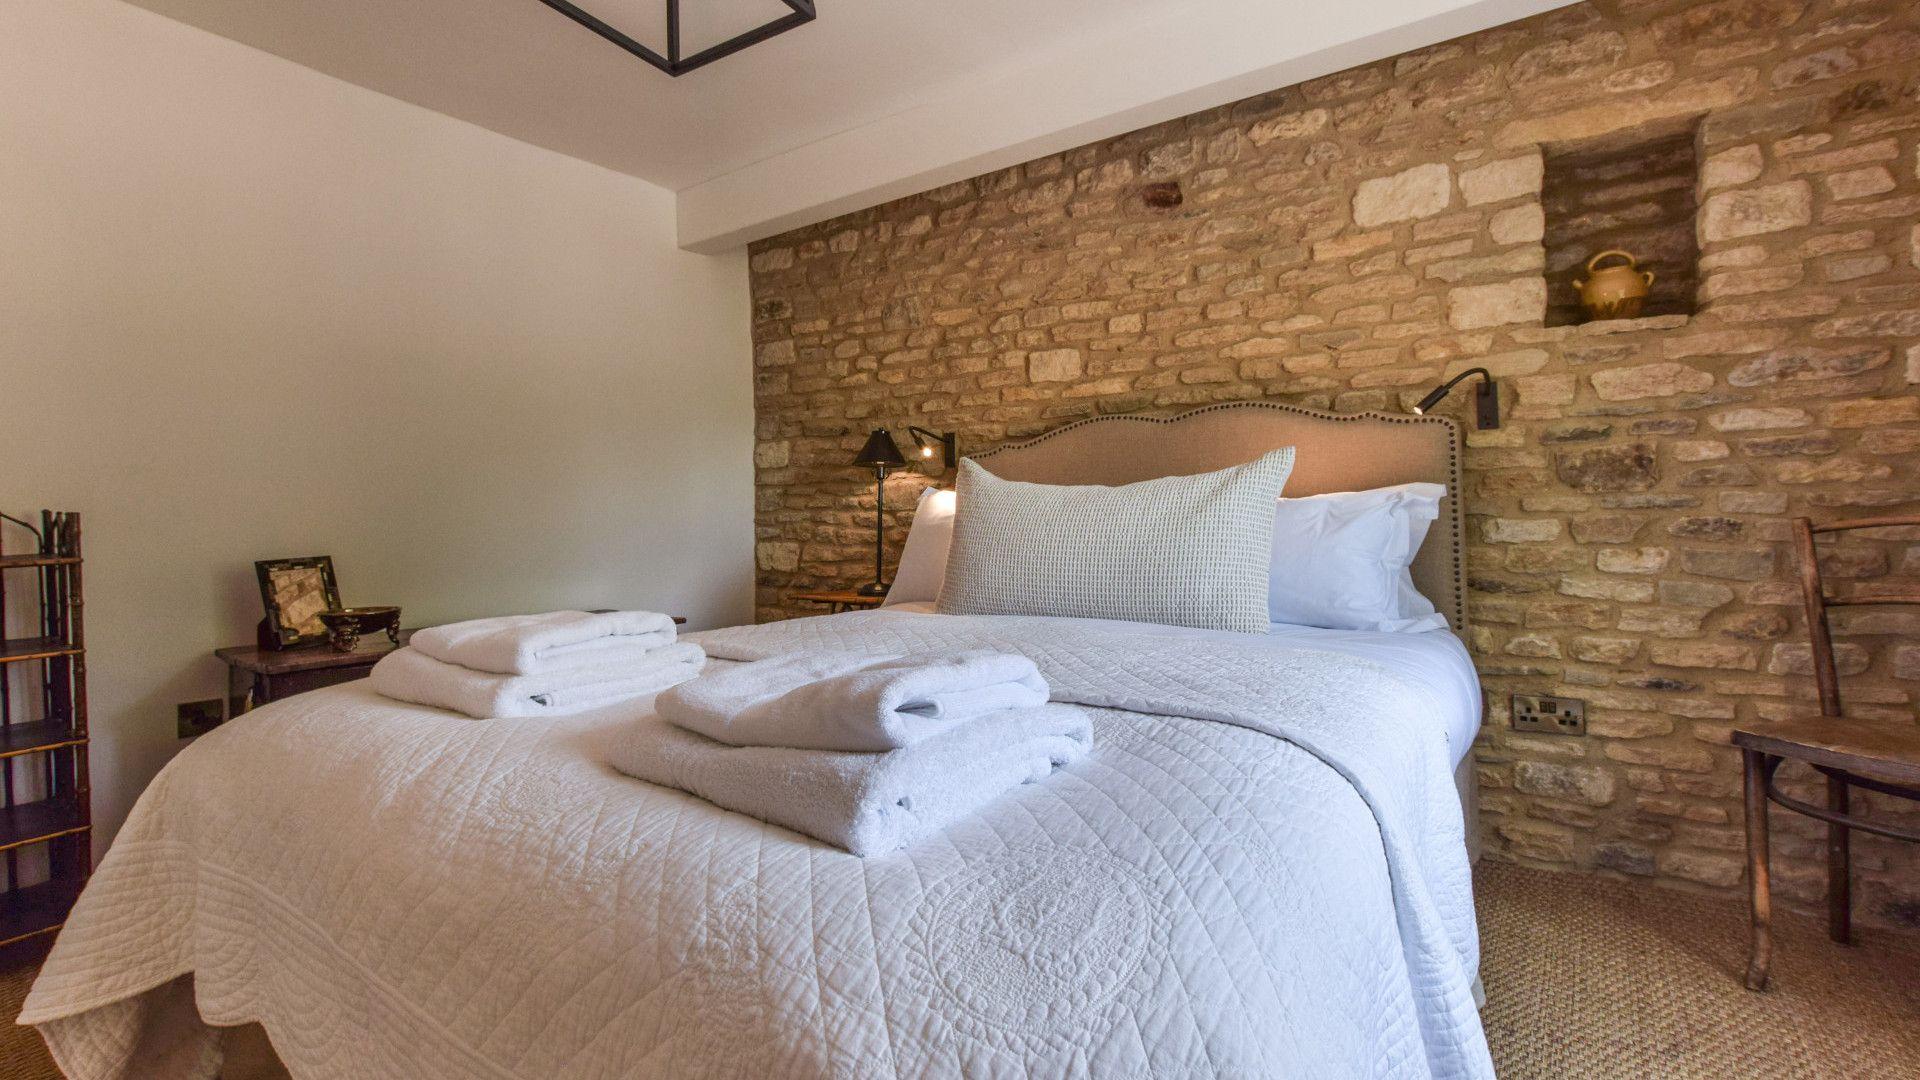 Bedroom 2 - king-size, Brown's Cottage, Bolthole Retreats